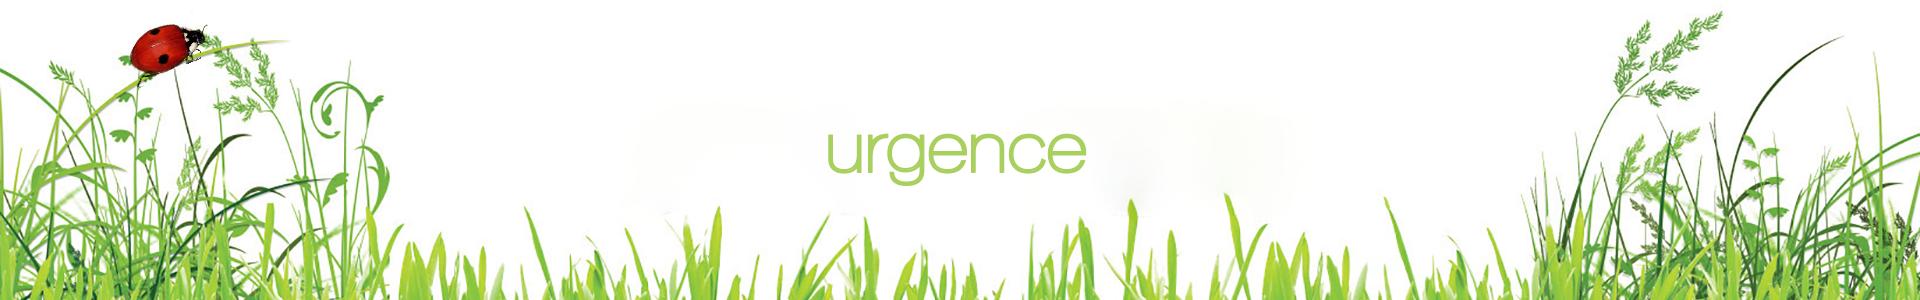 urgence-banniere.png